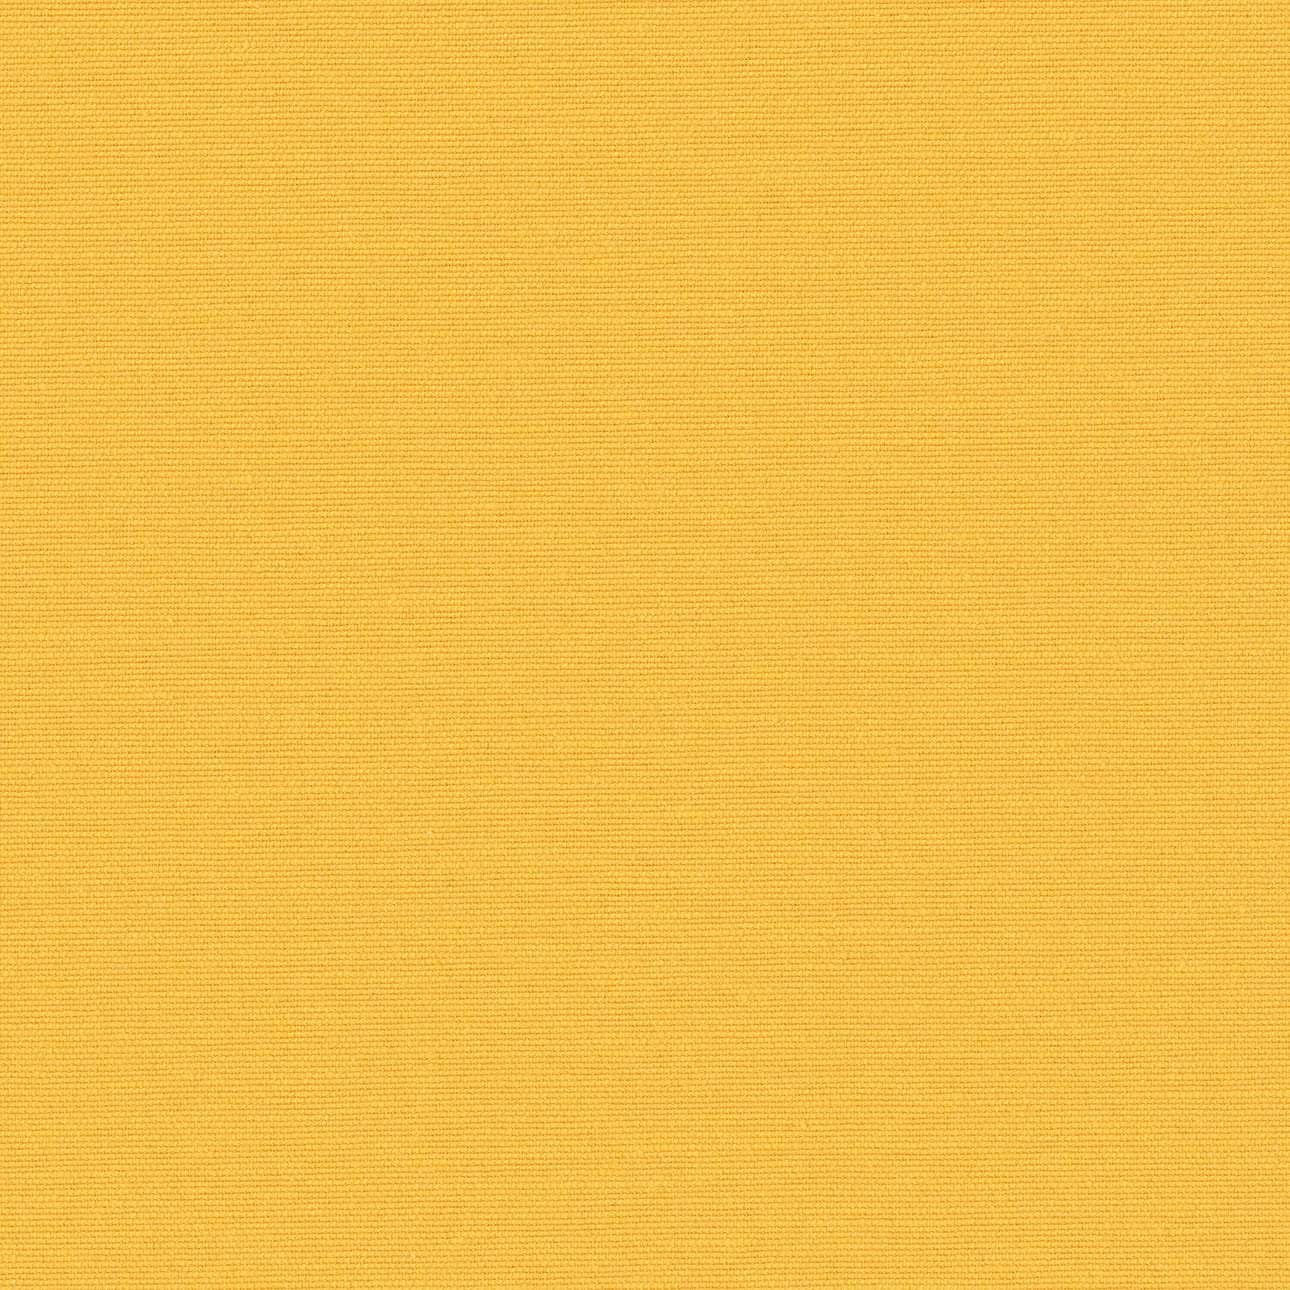 Loneta 133-40 w kolekcji Loneta, tkanina: 133-40